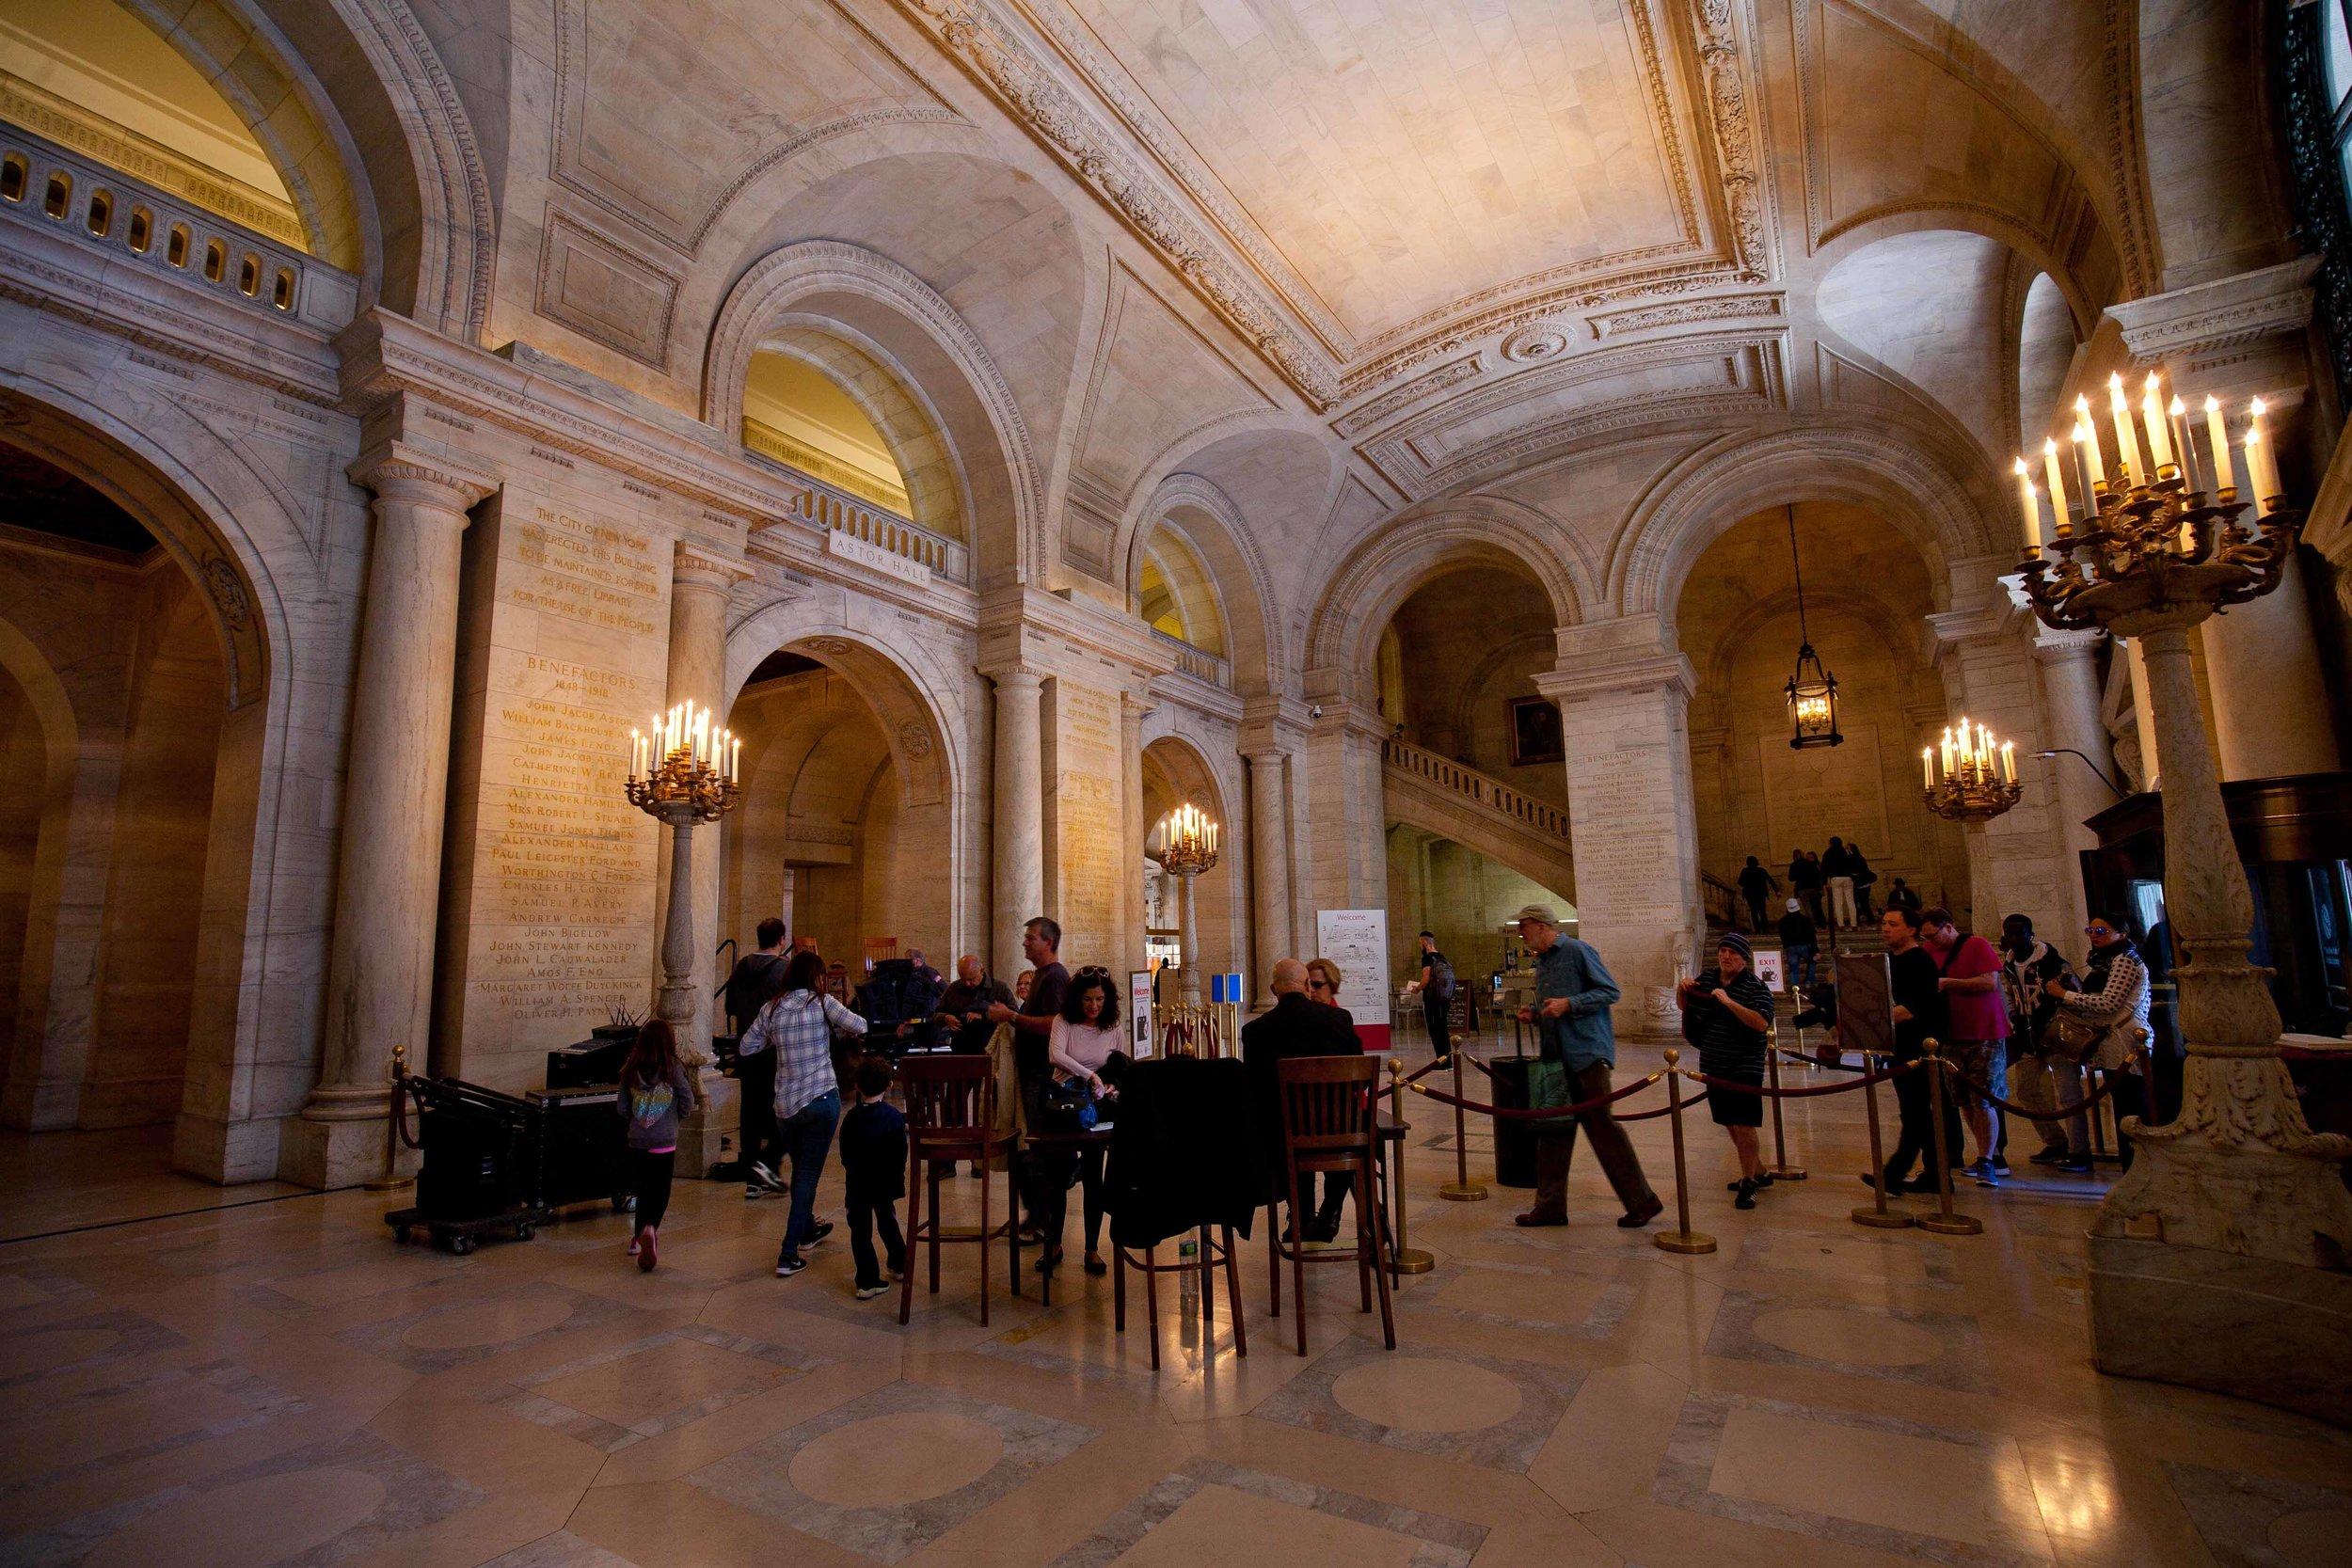 interior of the New York Public Library's Lobby - New York City 2016